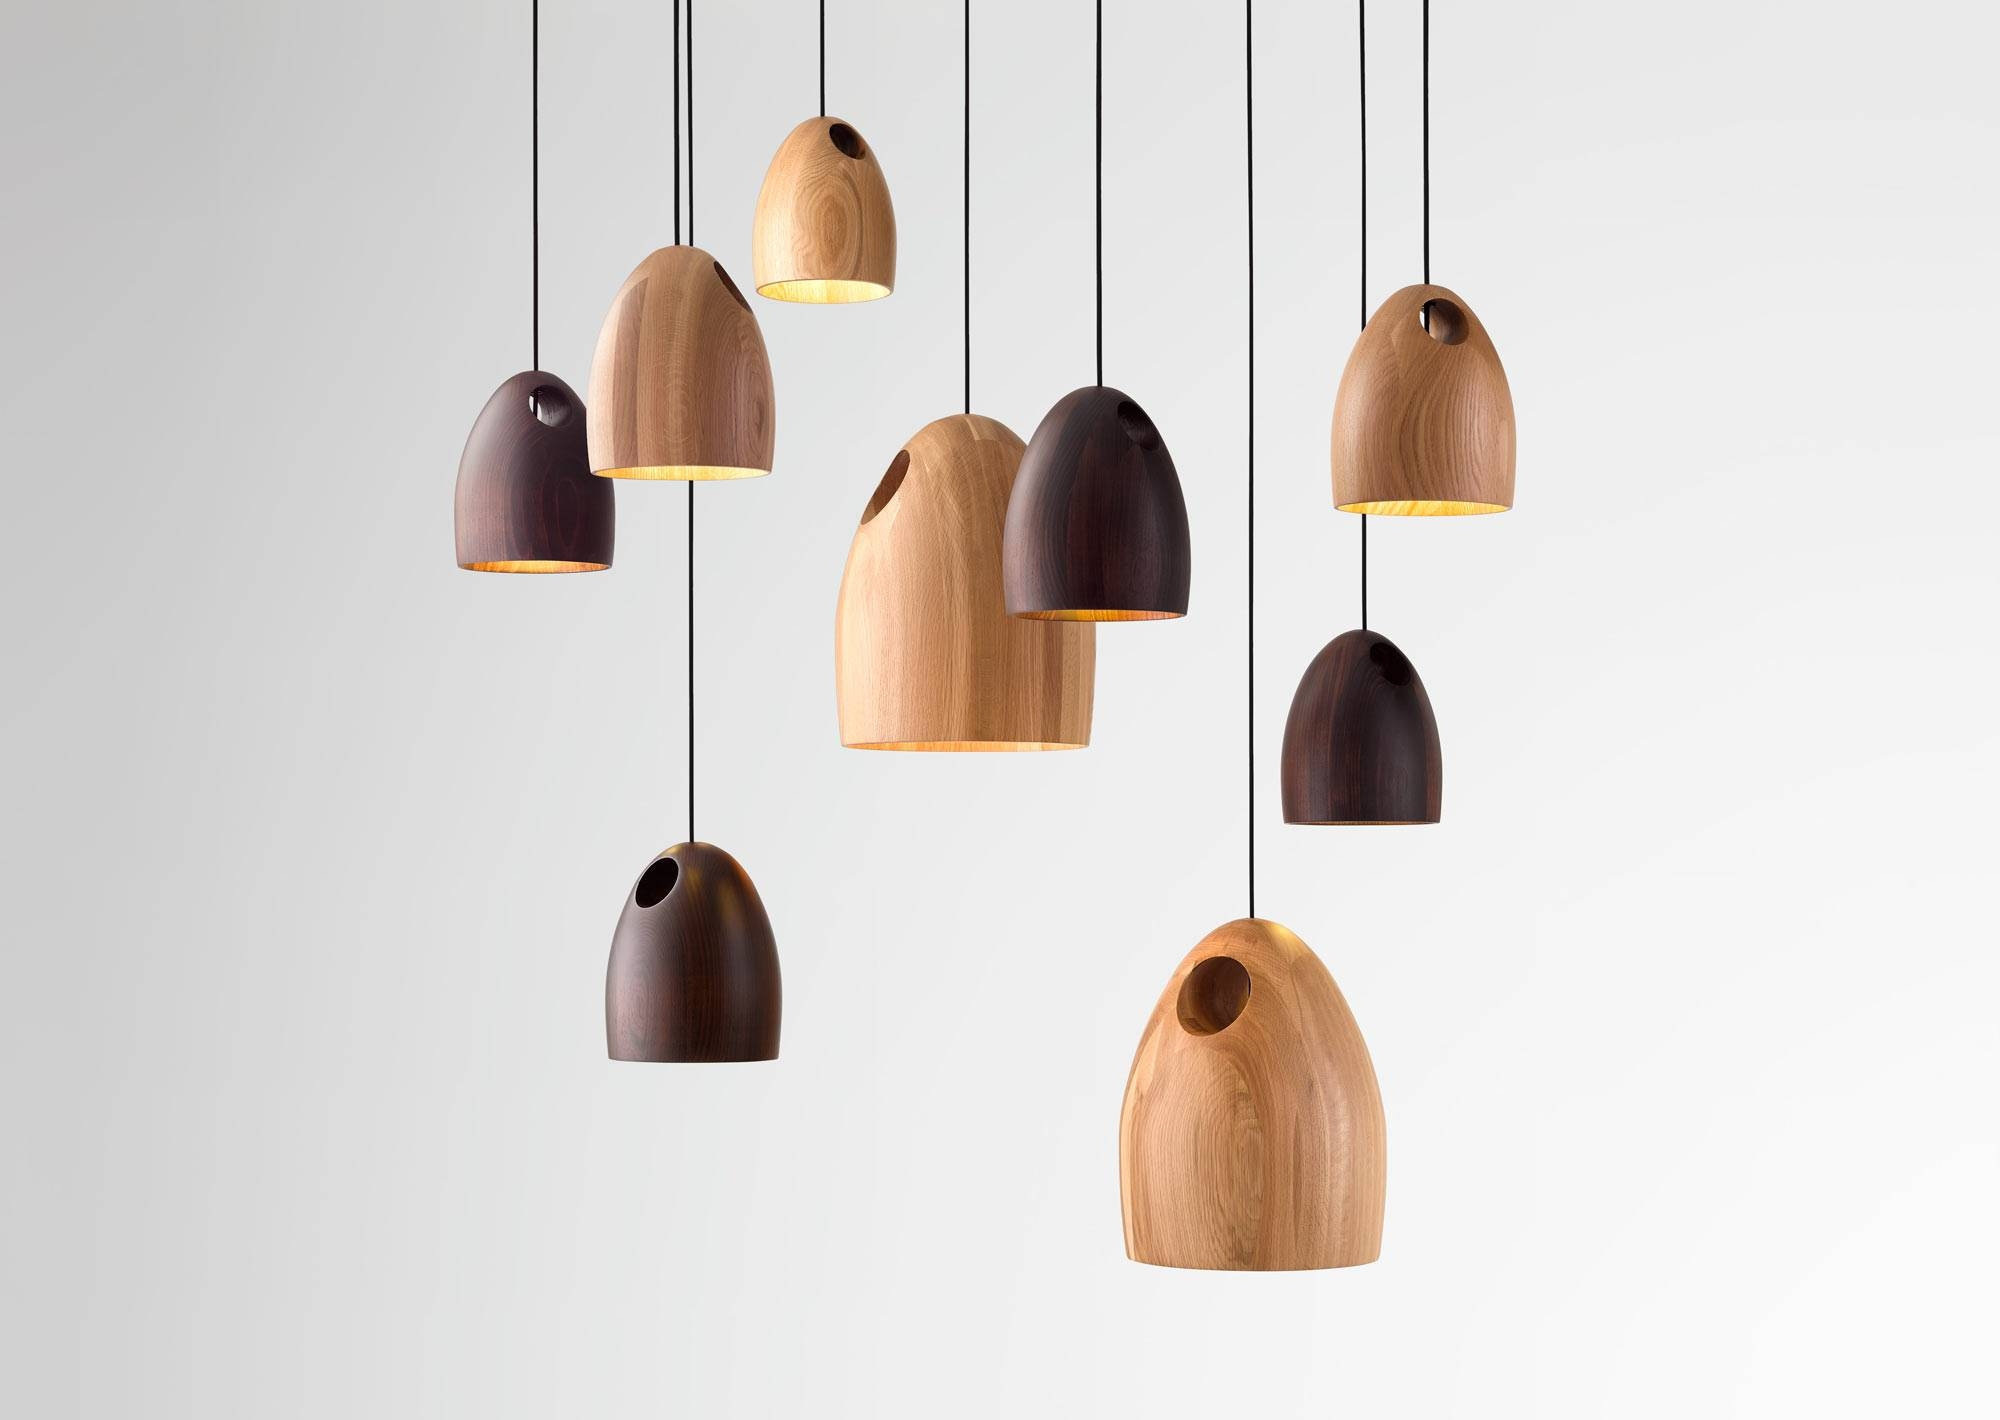 Oak Pendant Light | Ross Gardam - Melbourne Australia with Pendant Lights Melbourne (Image 11 of 15)